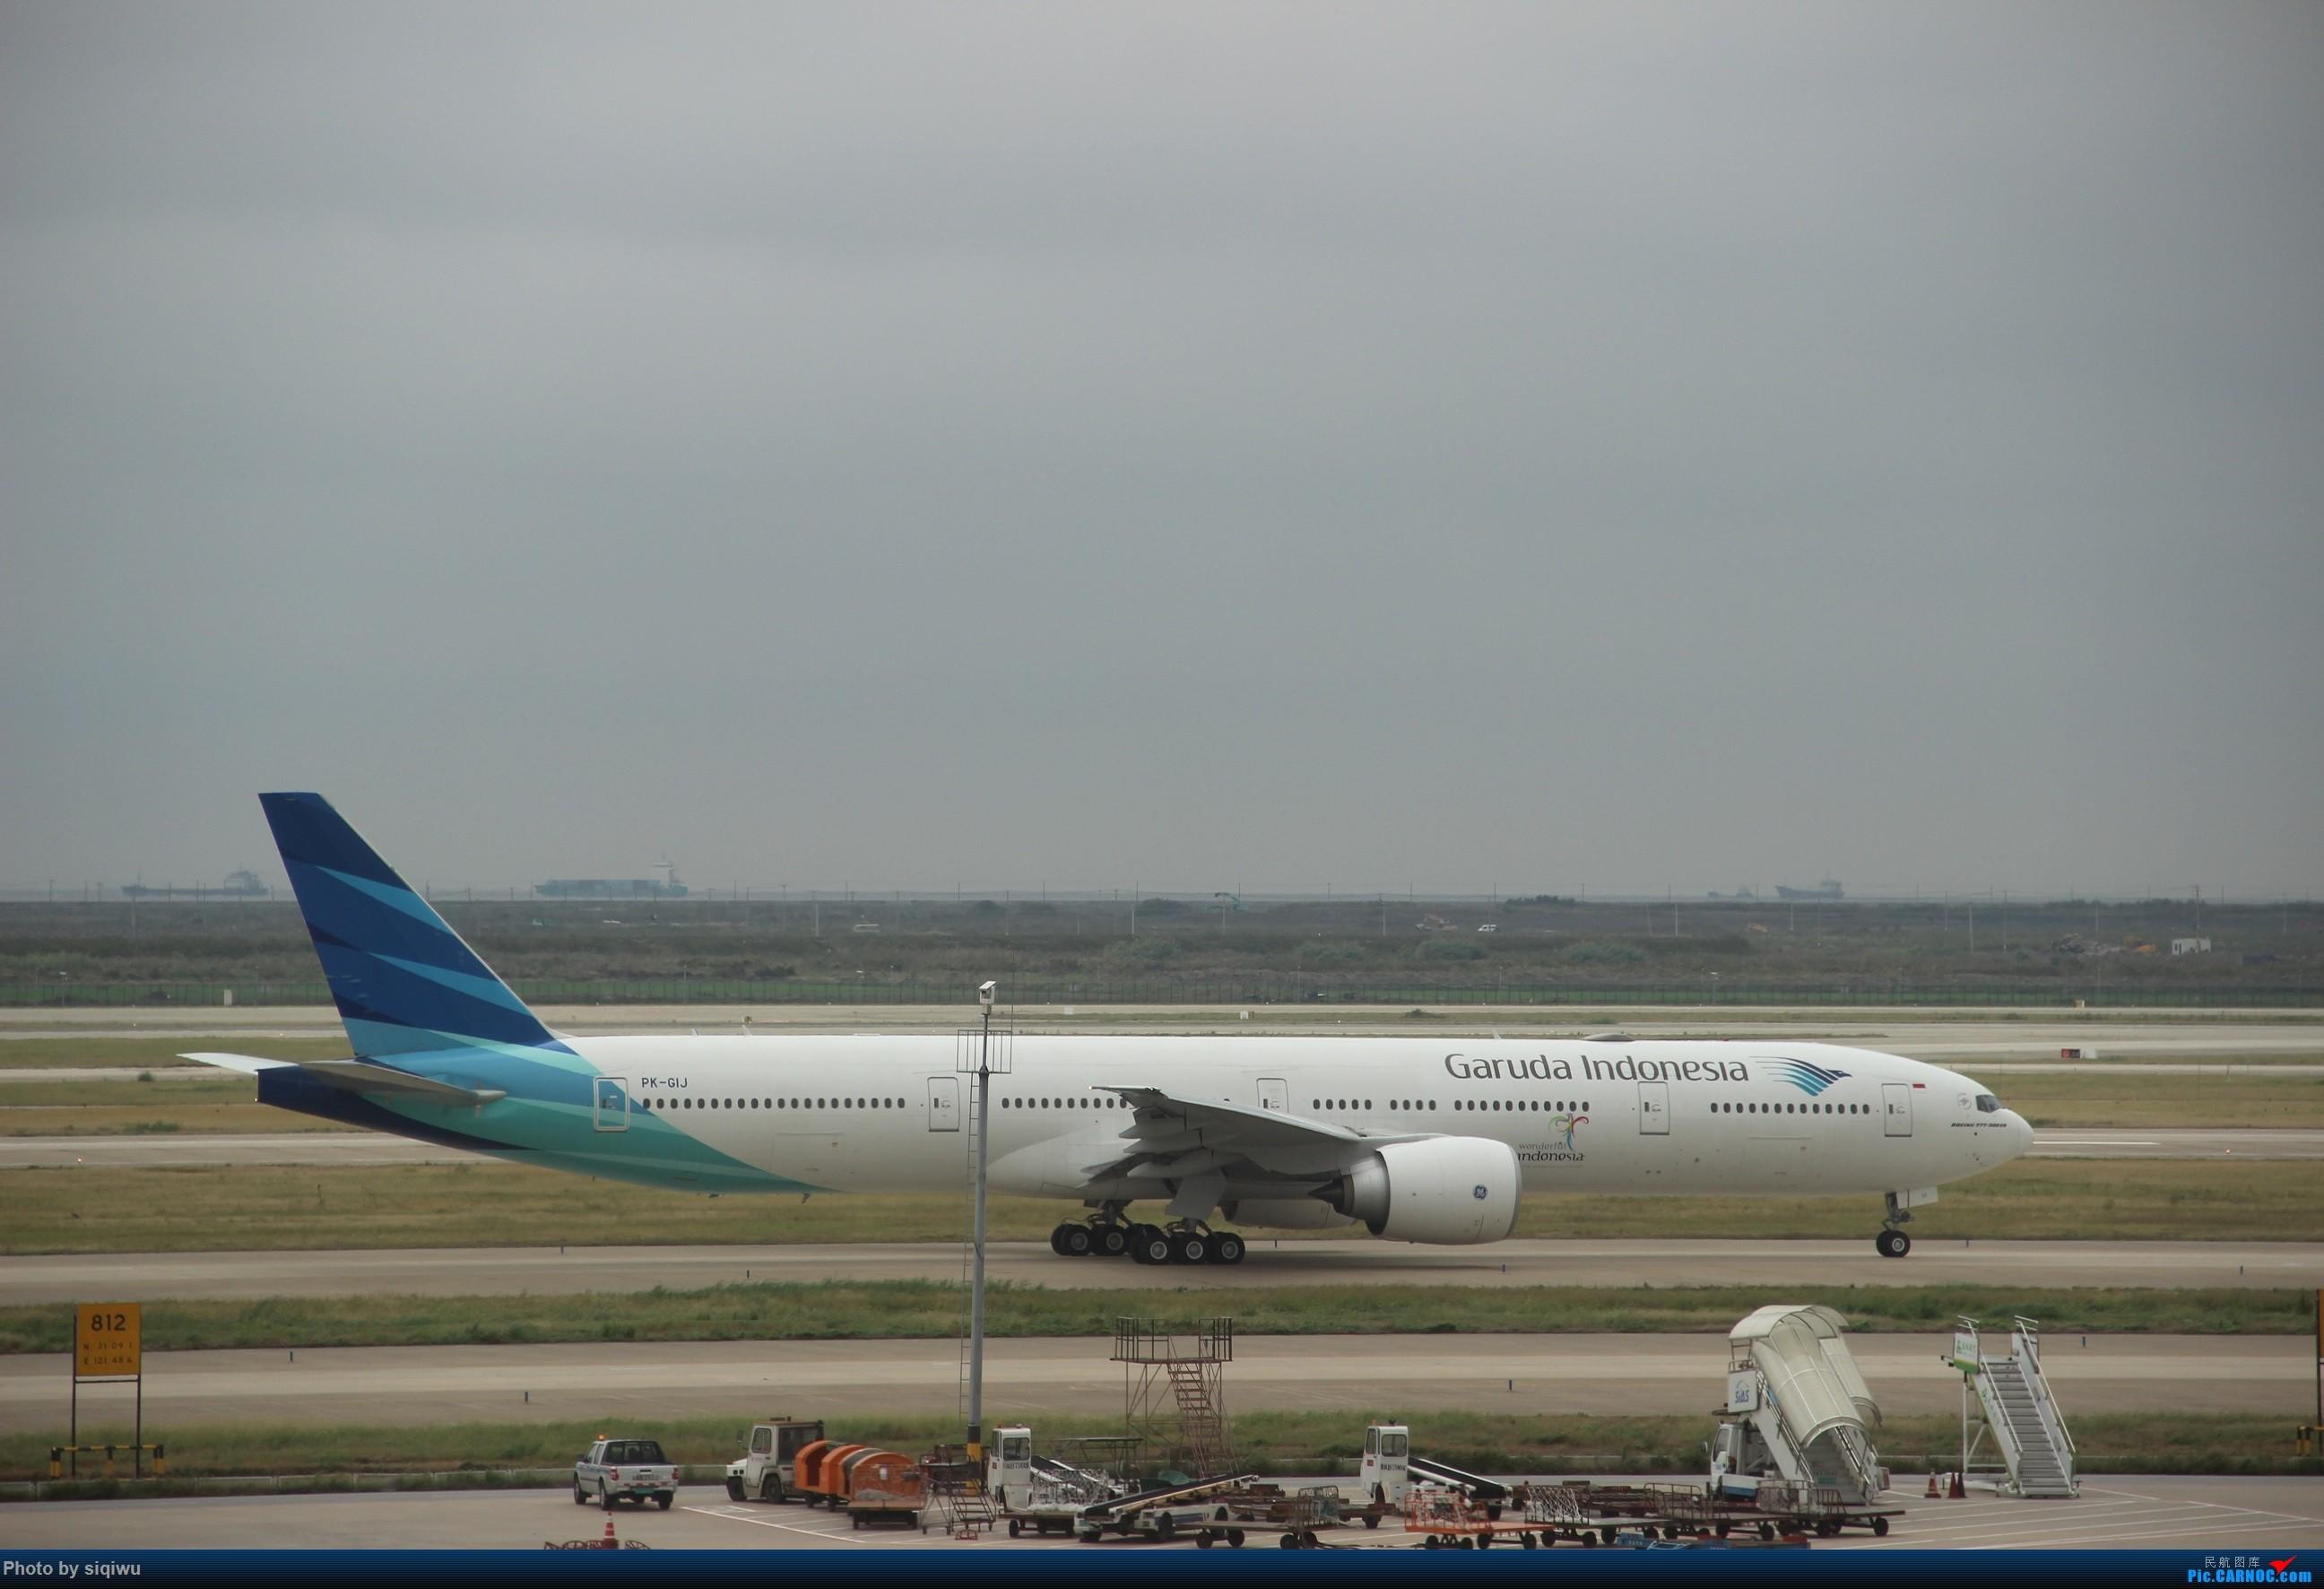 Re:[原创]PVG-HKG-KUL-HKG-PVG 四天往返,CX/KA BOEING 777-300ER  中国上海浦东国际机场